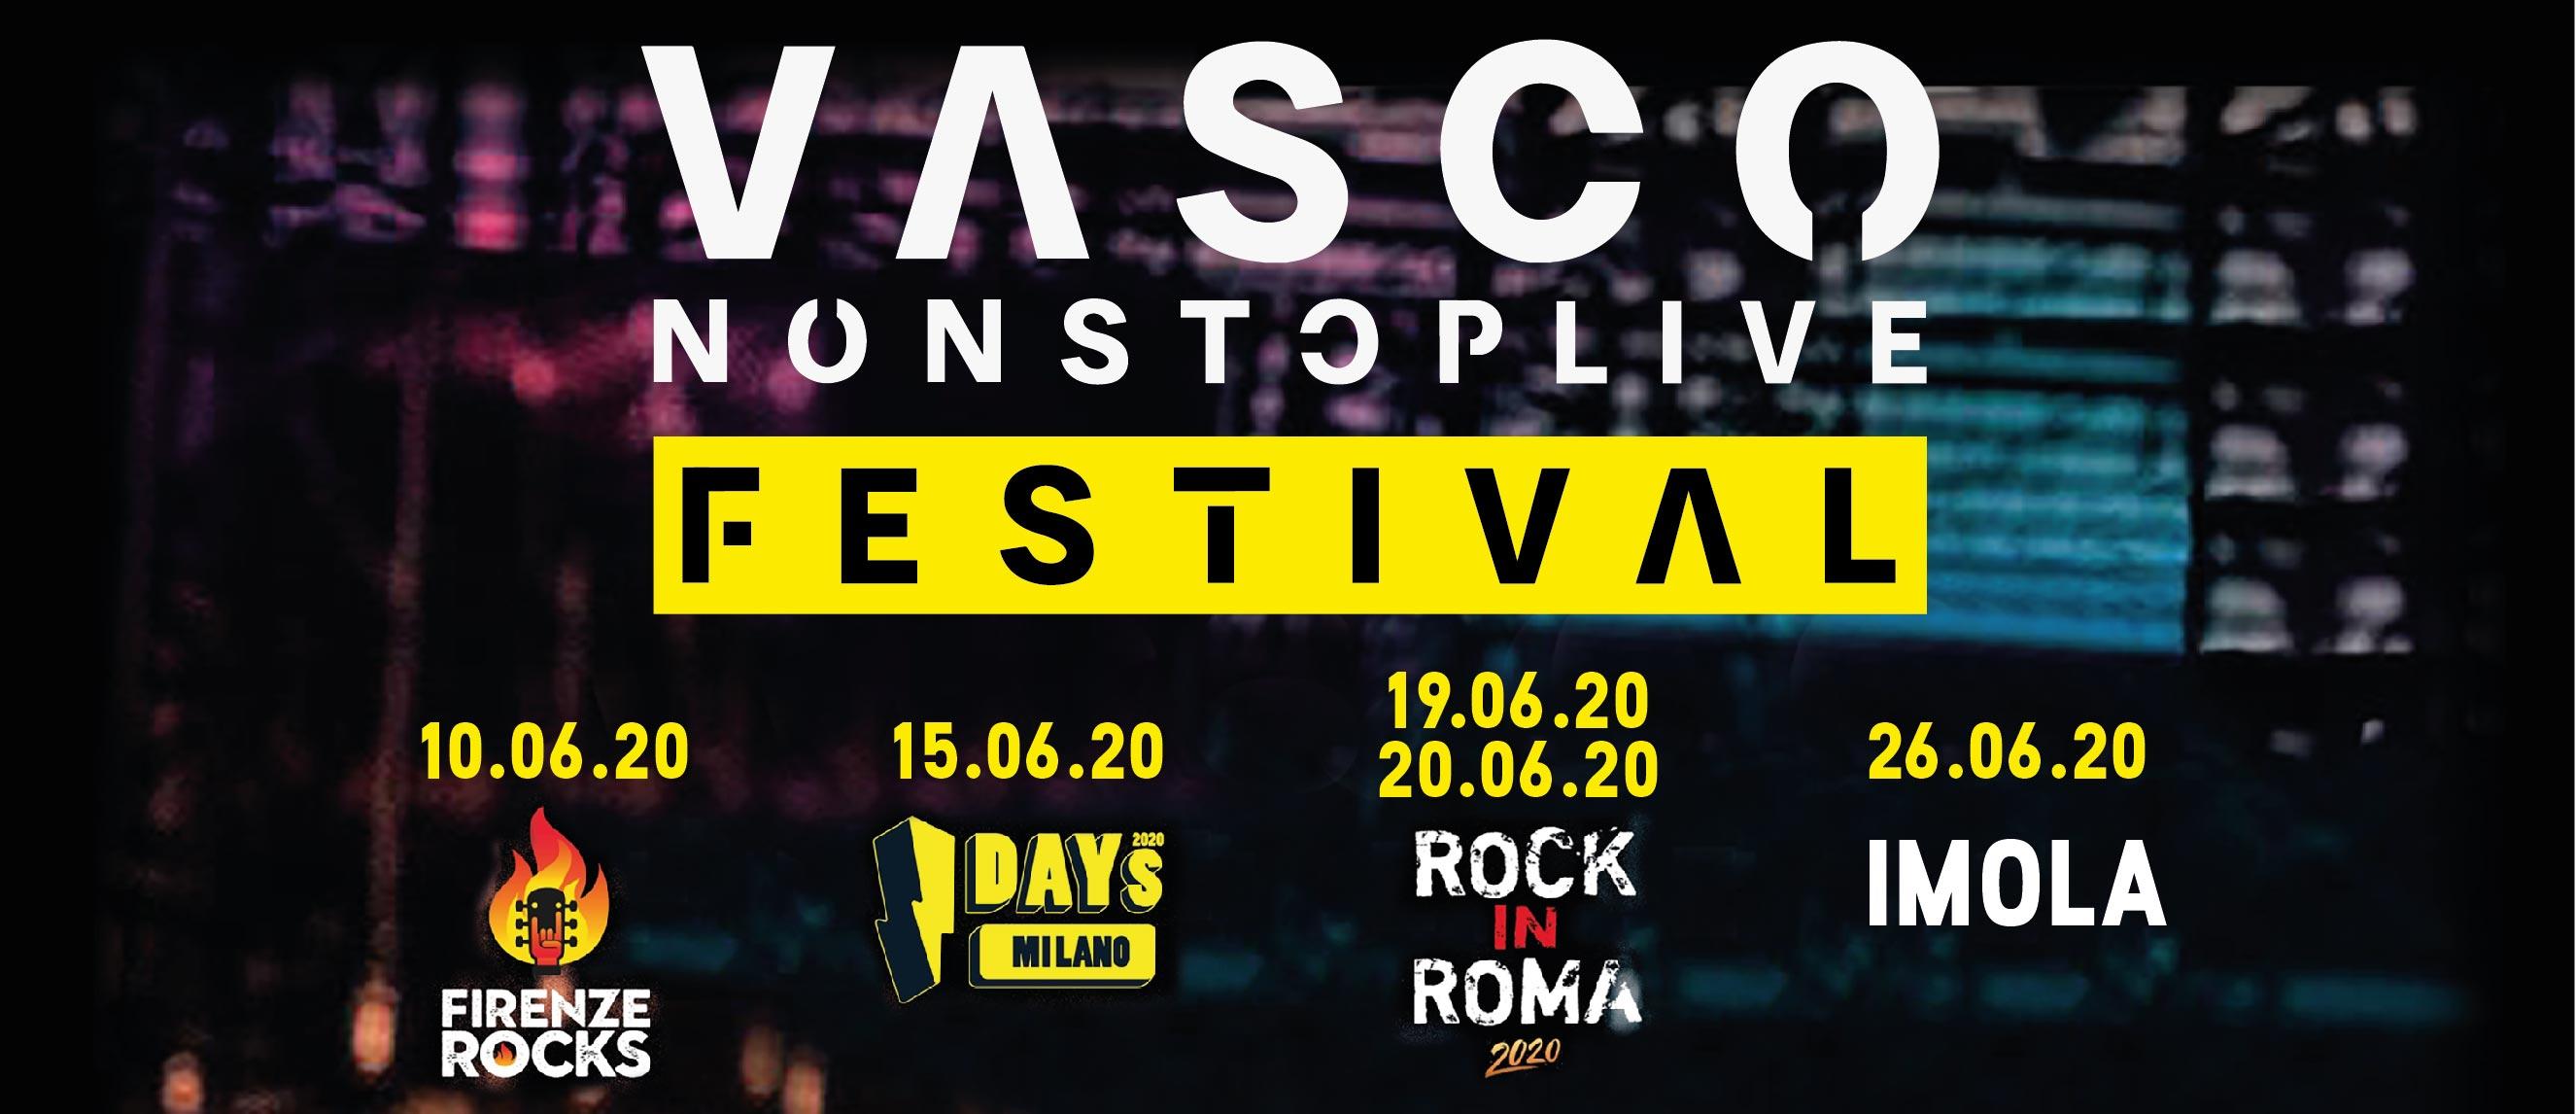 Vasco non stop live festival